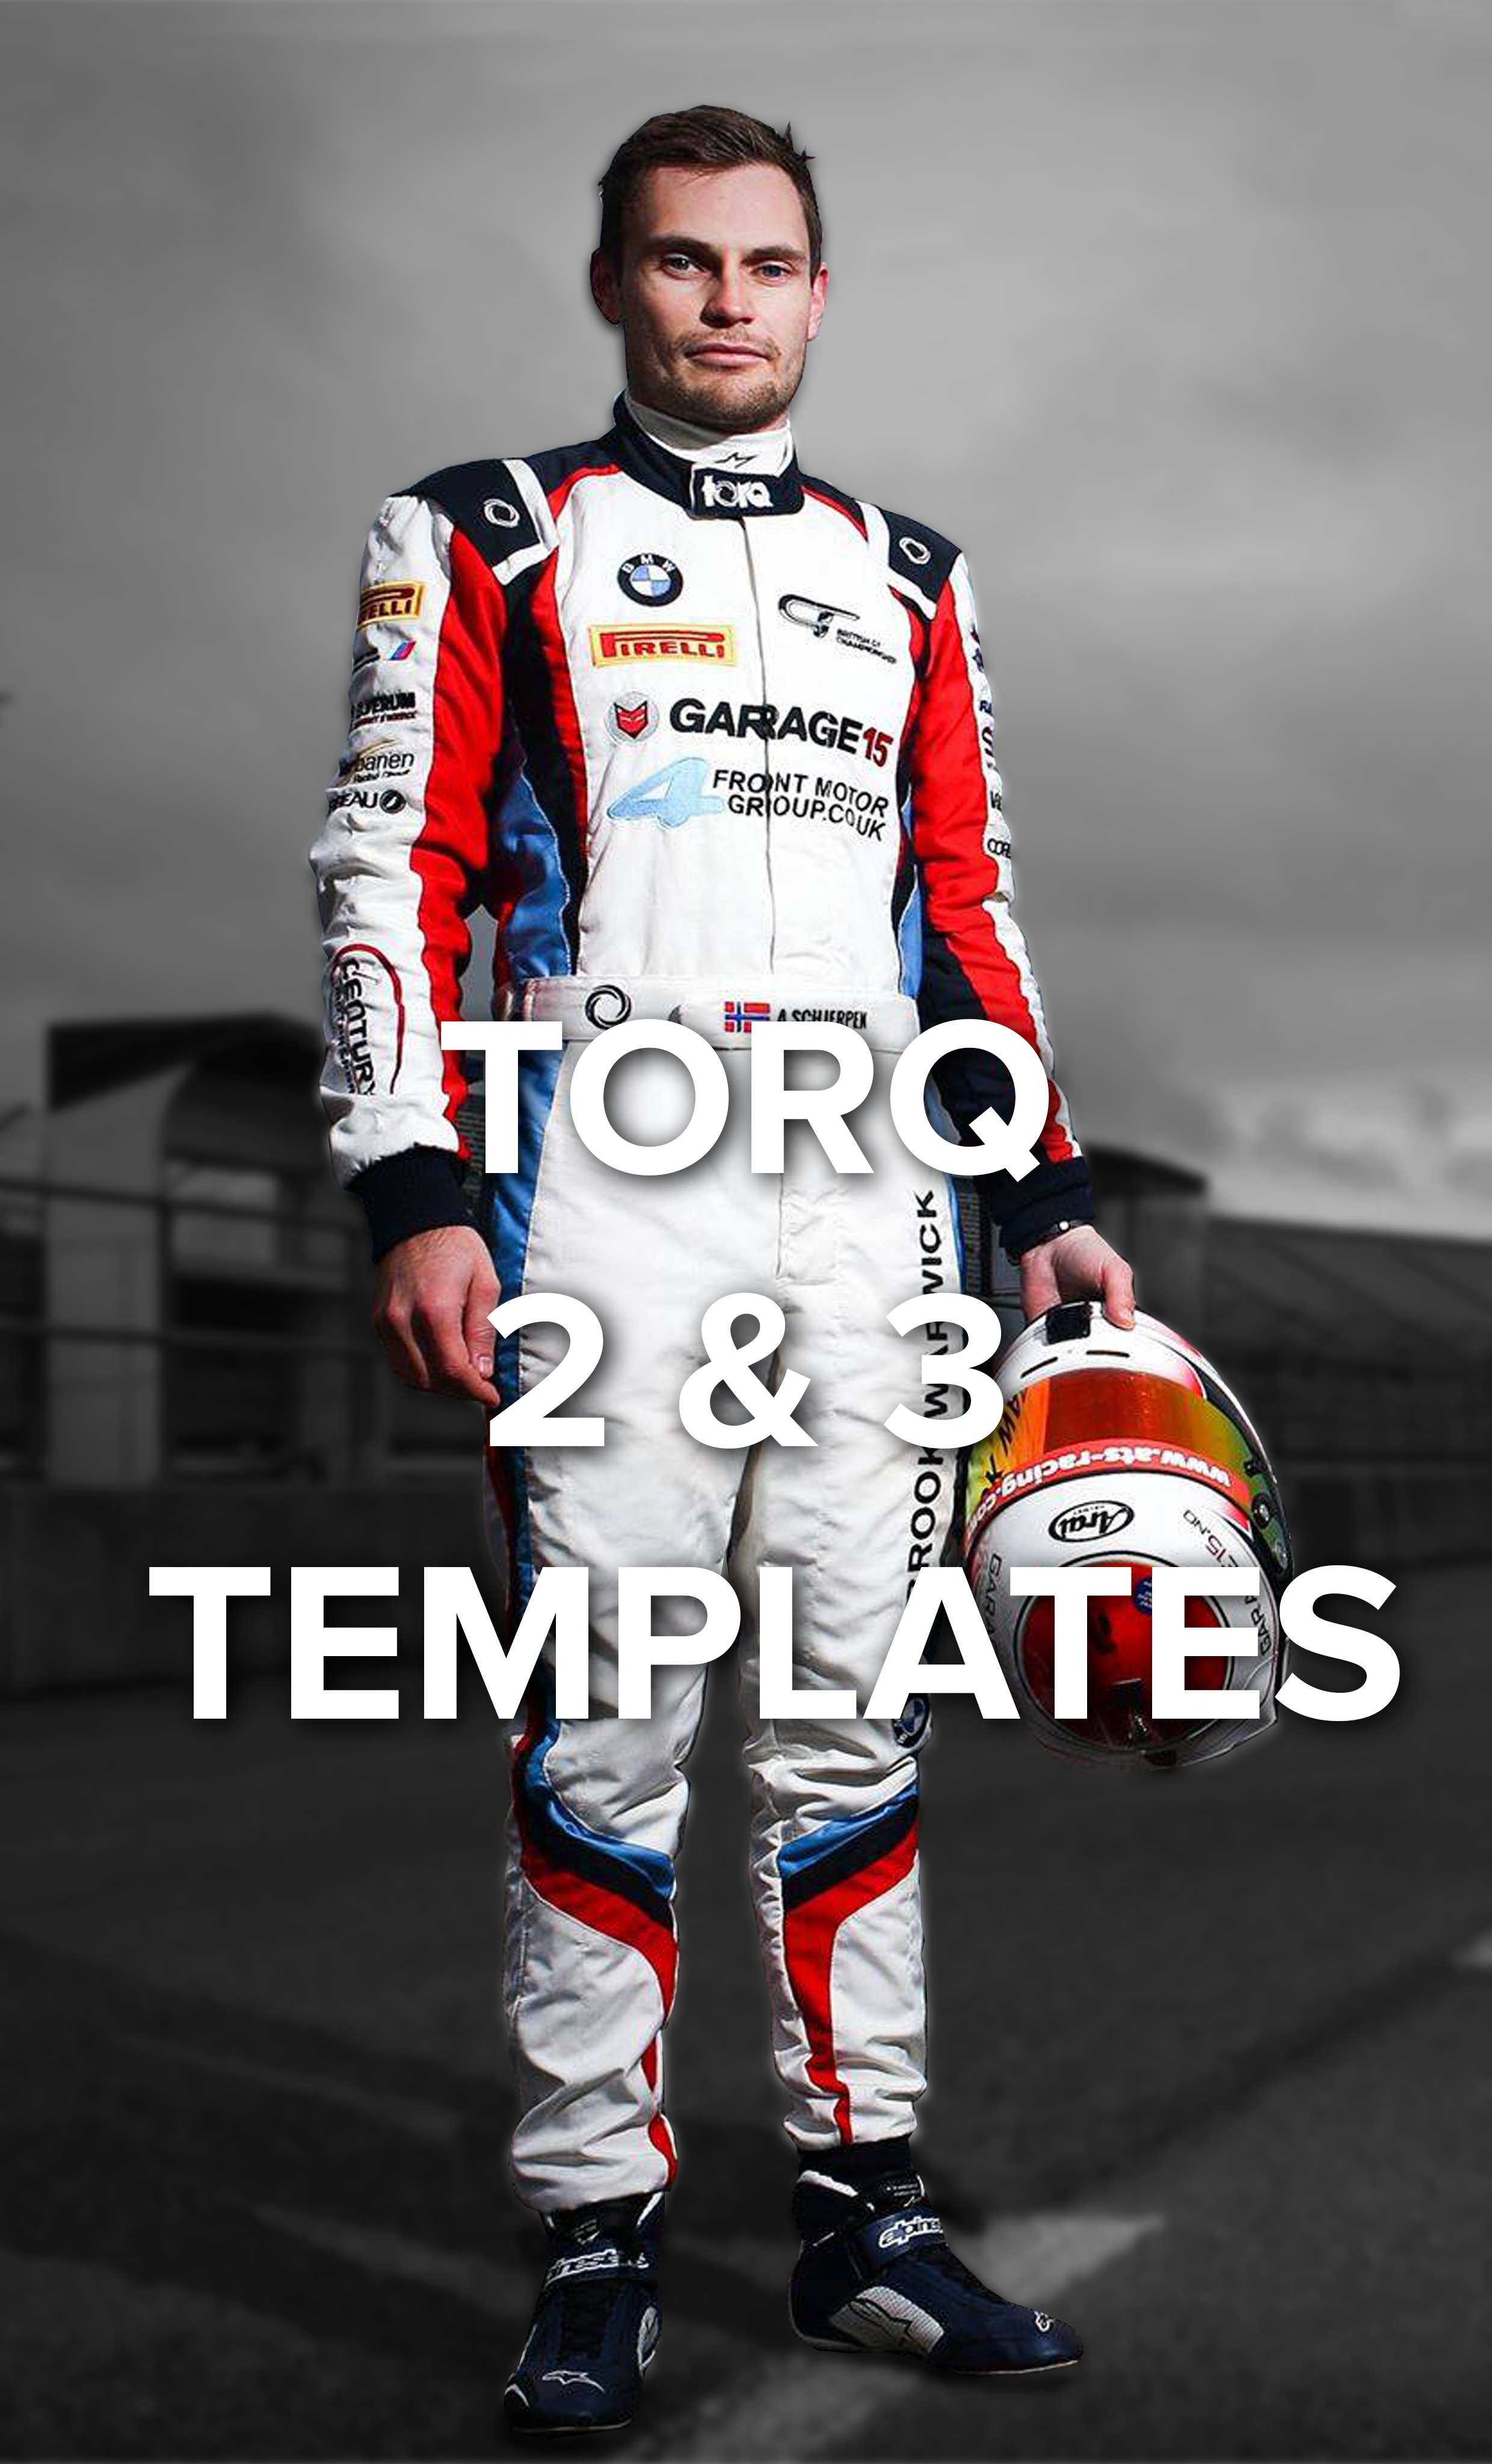 torq 2 + 3 Templates.jpg